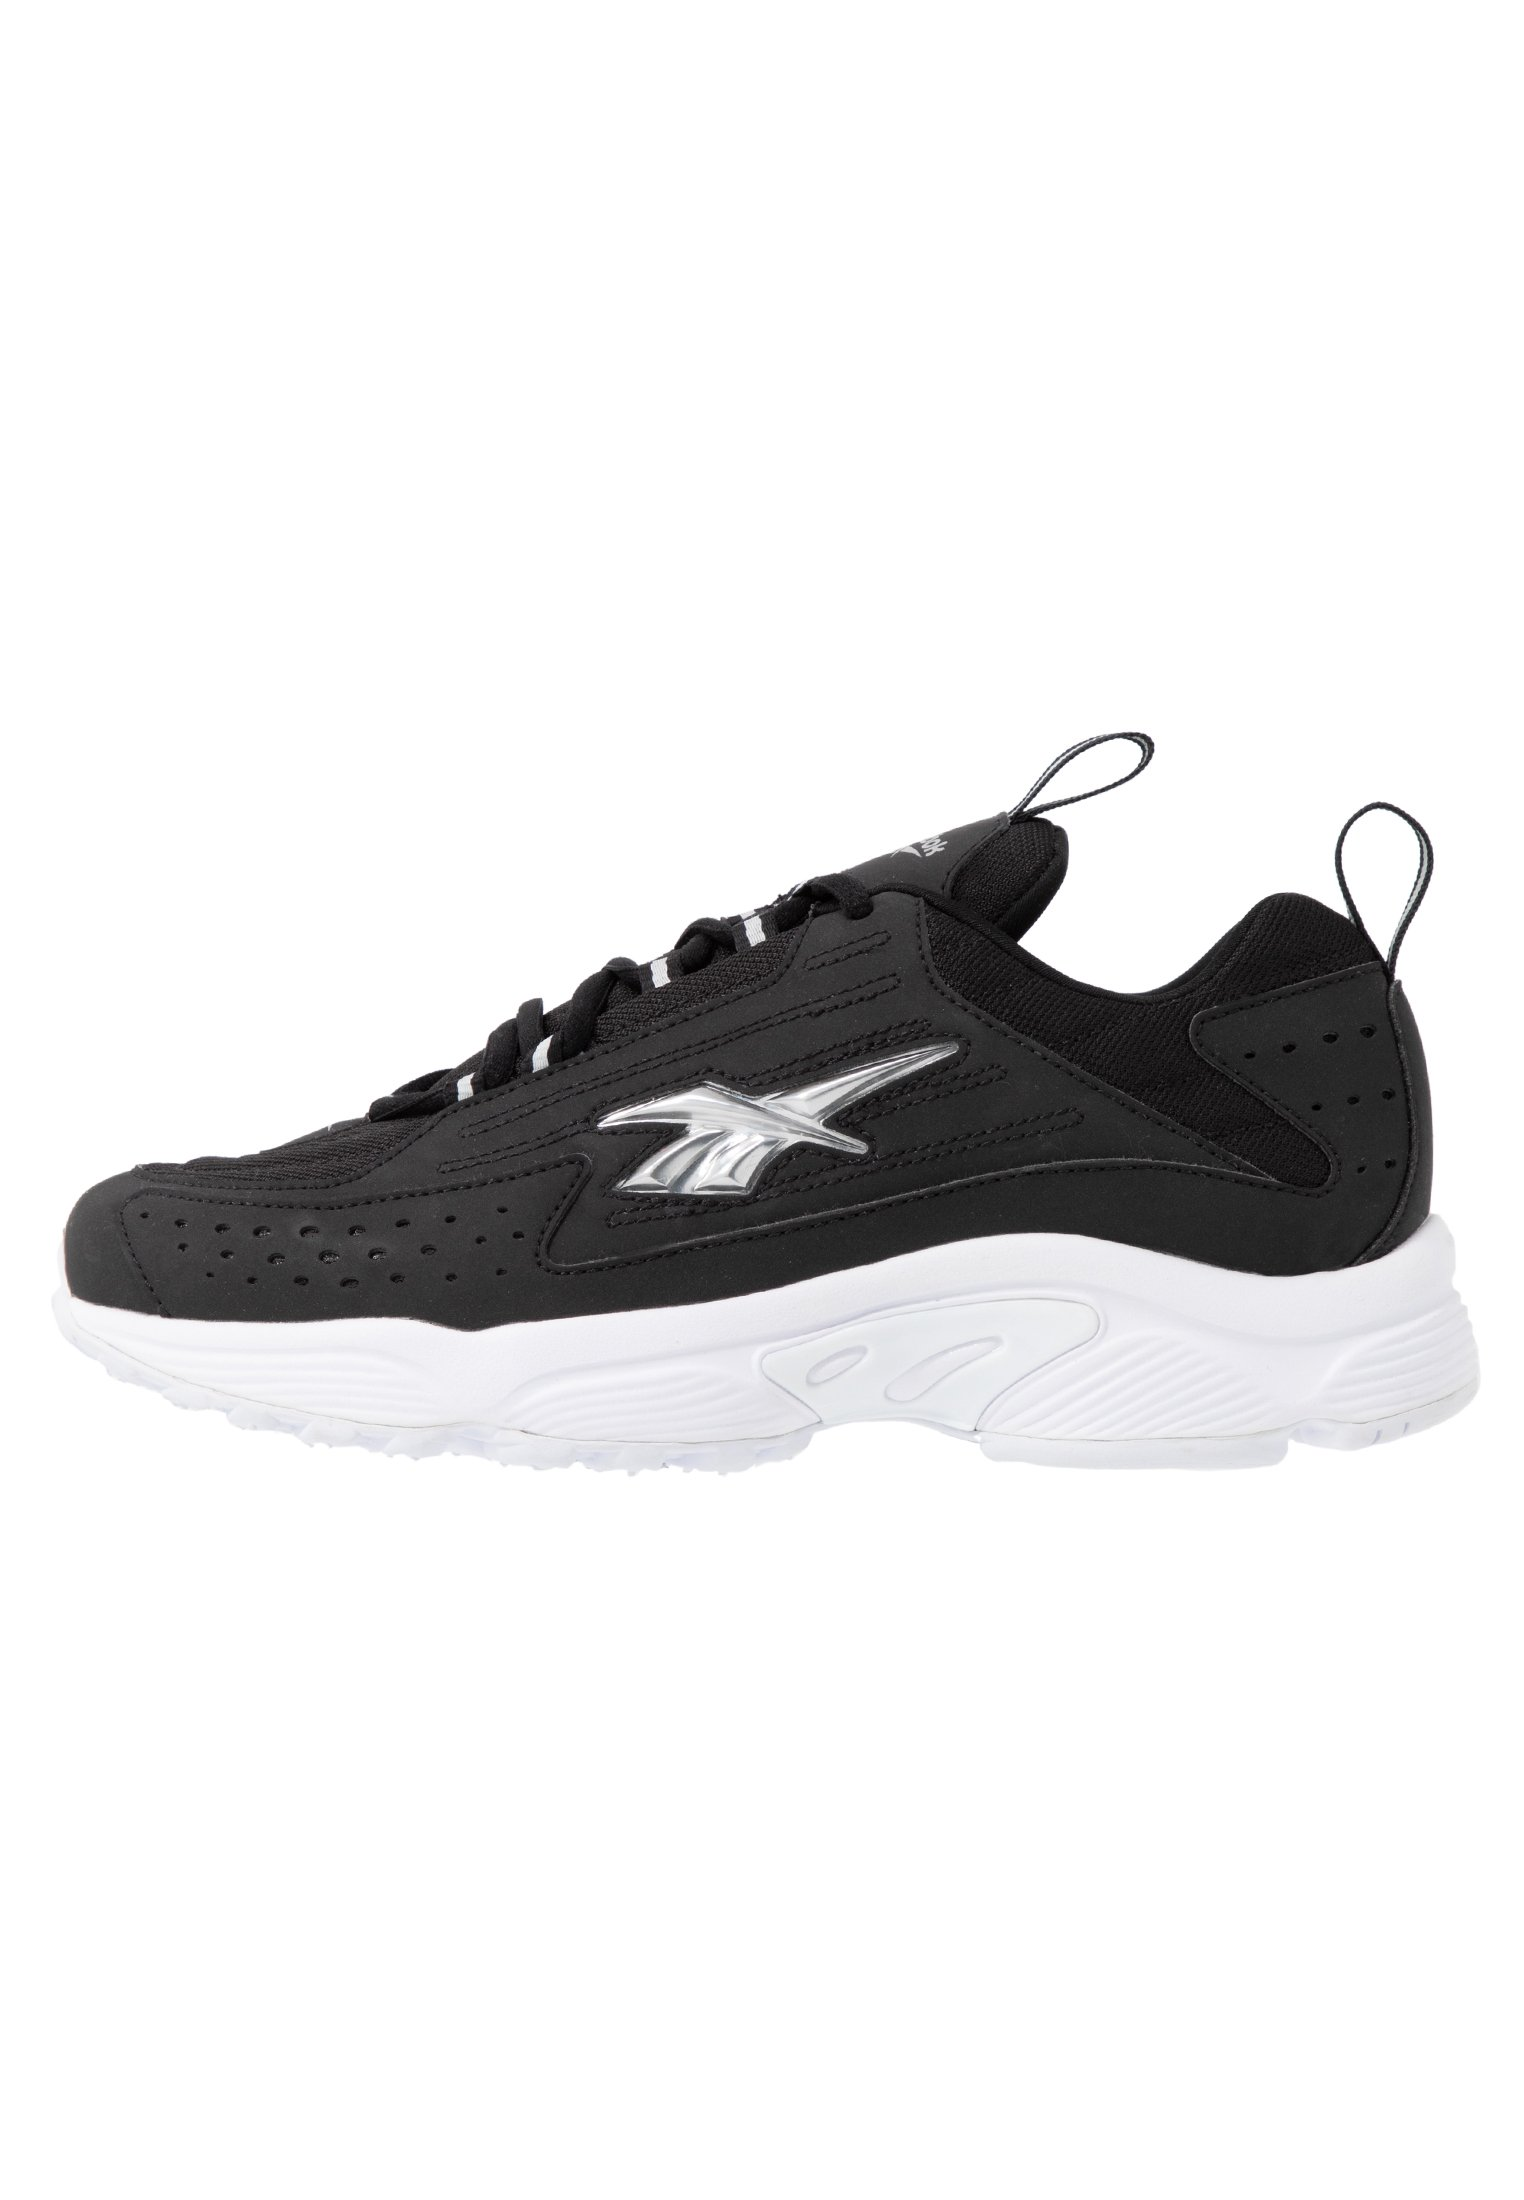 Reebok Classic Dmx Series 2200 - Sneakers Black/white